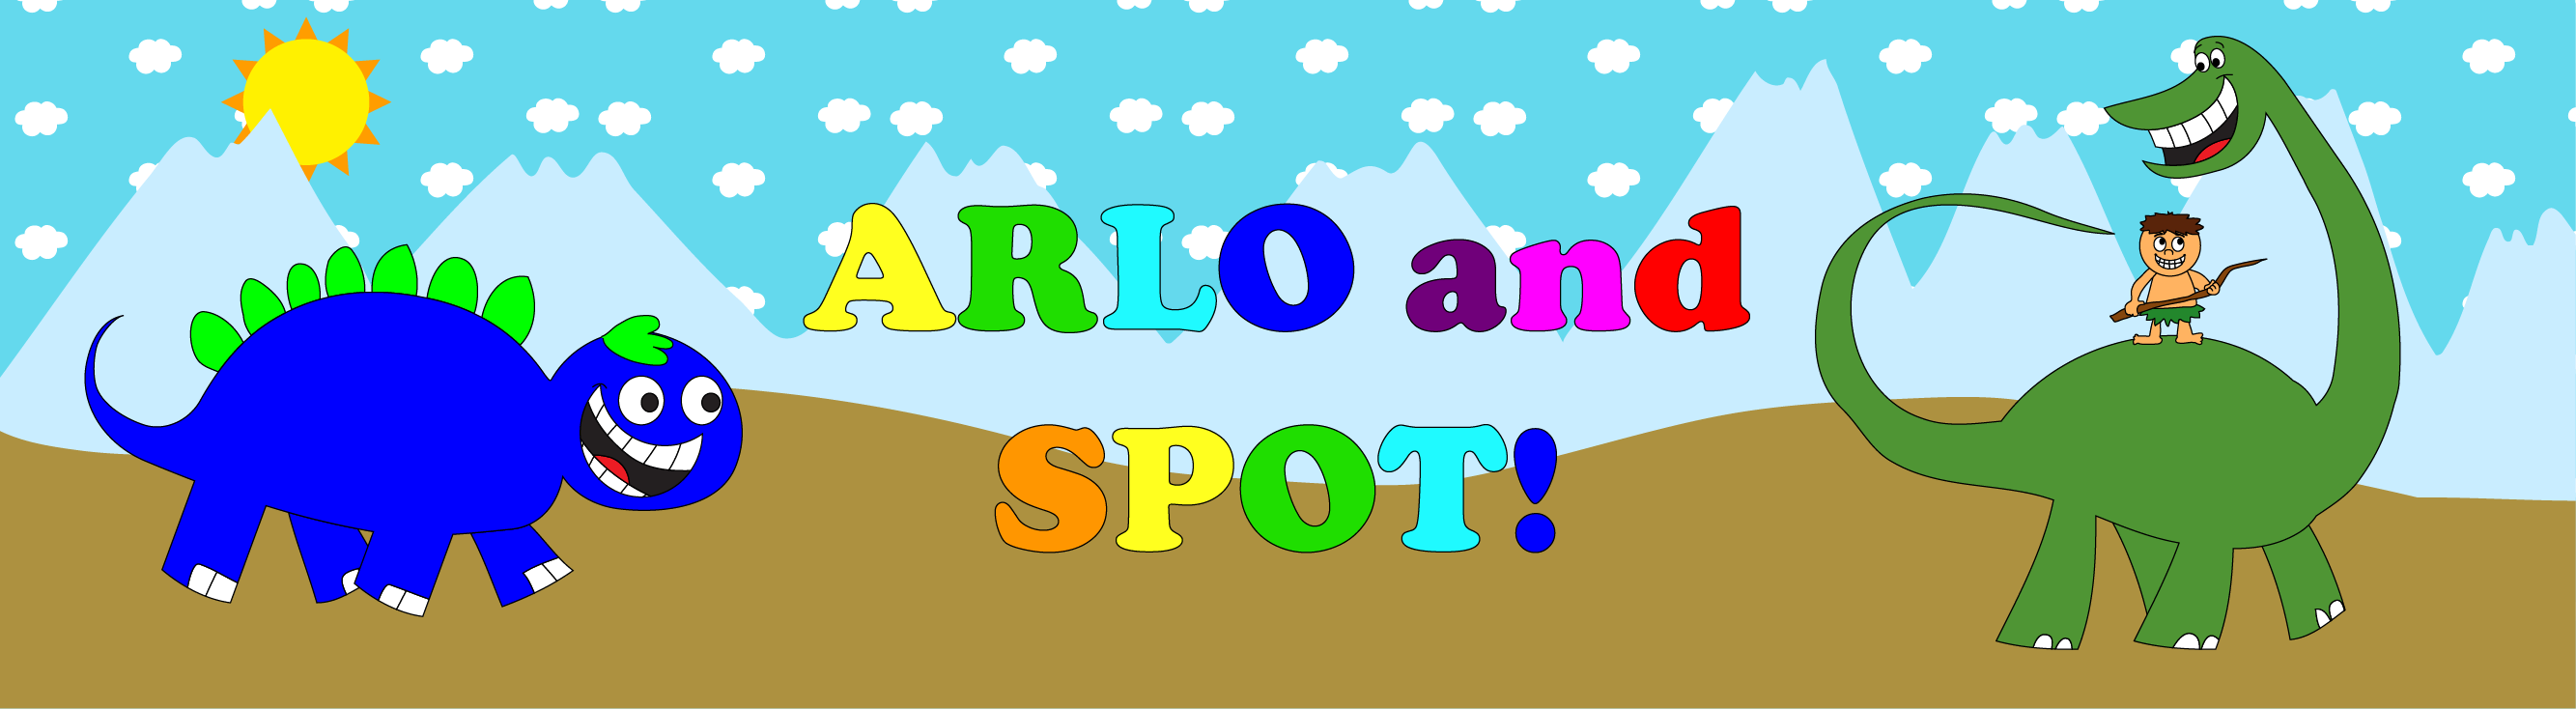 Arlo And Spot